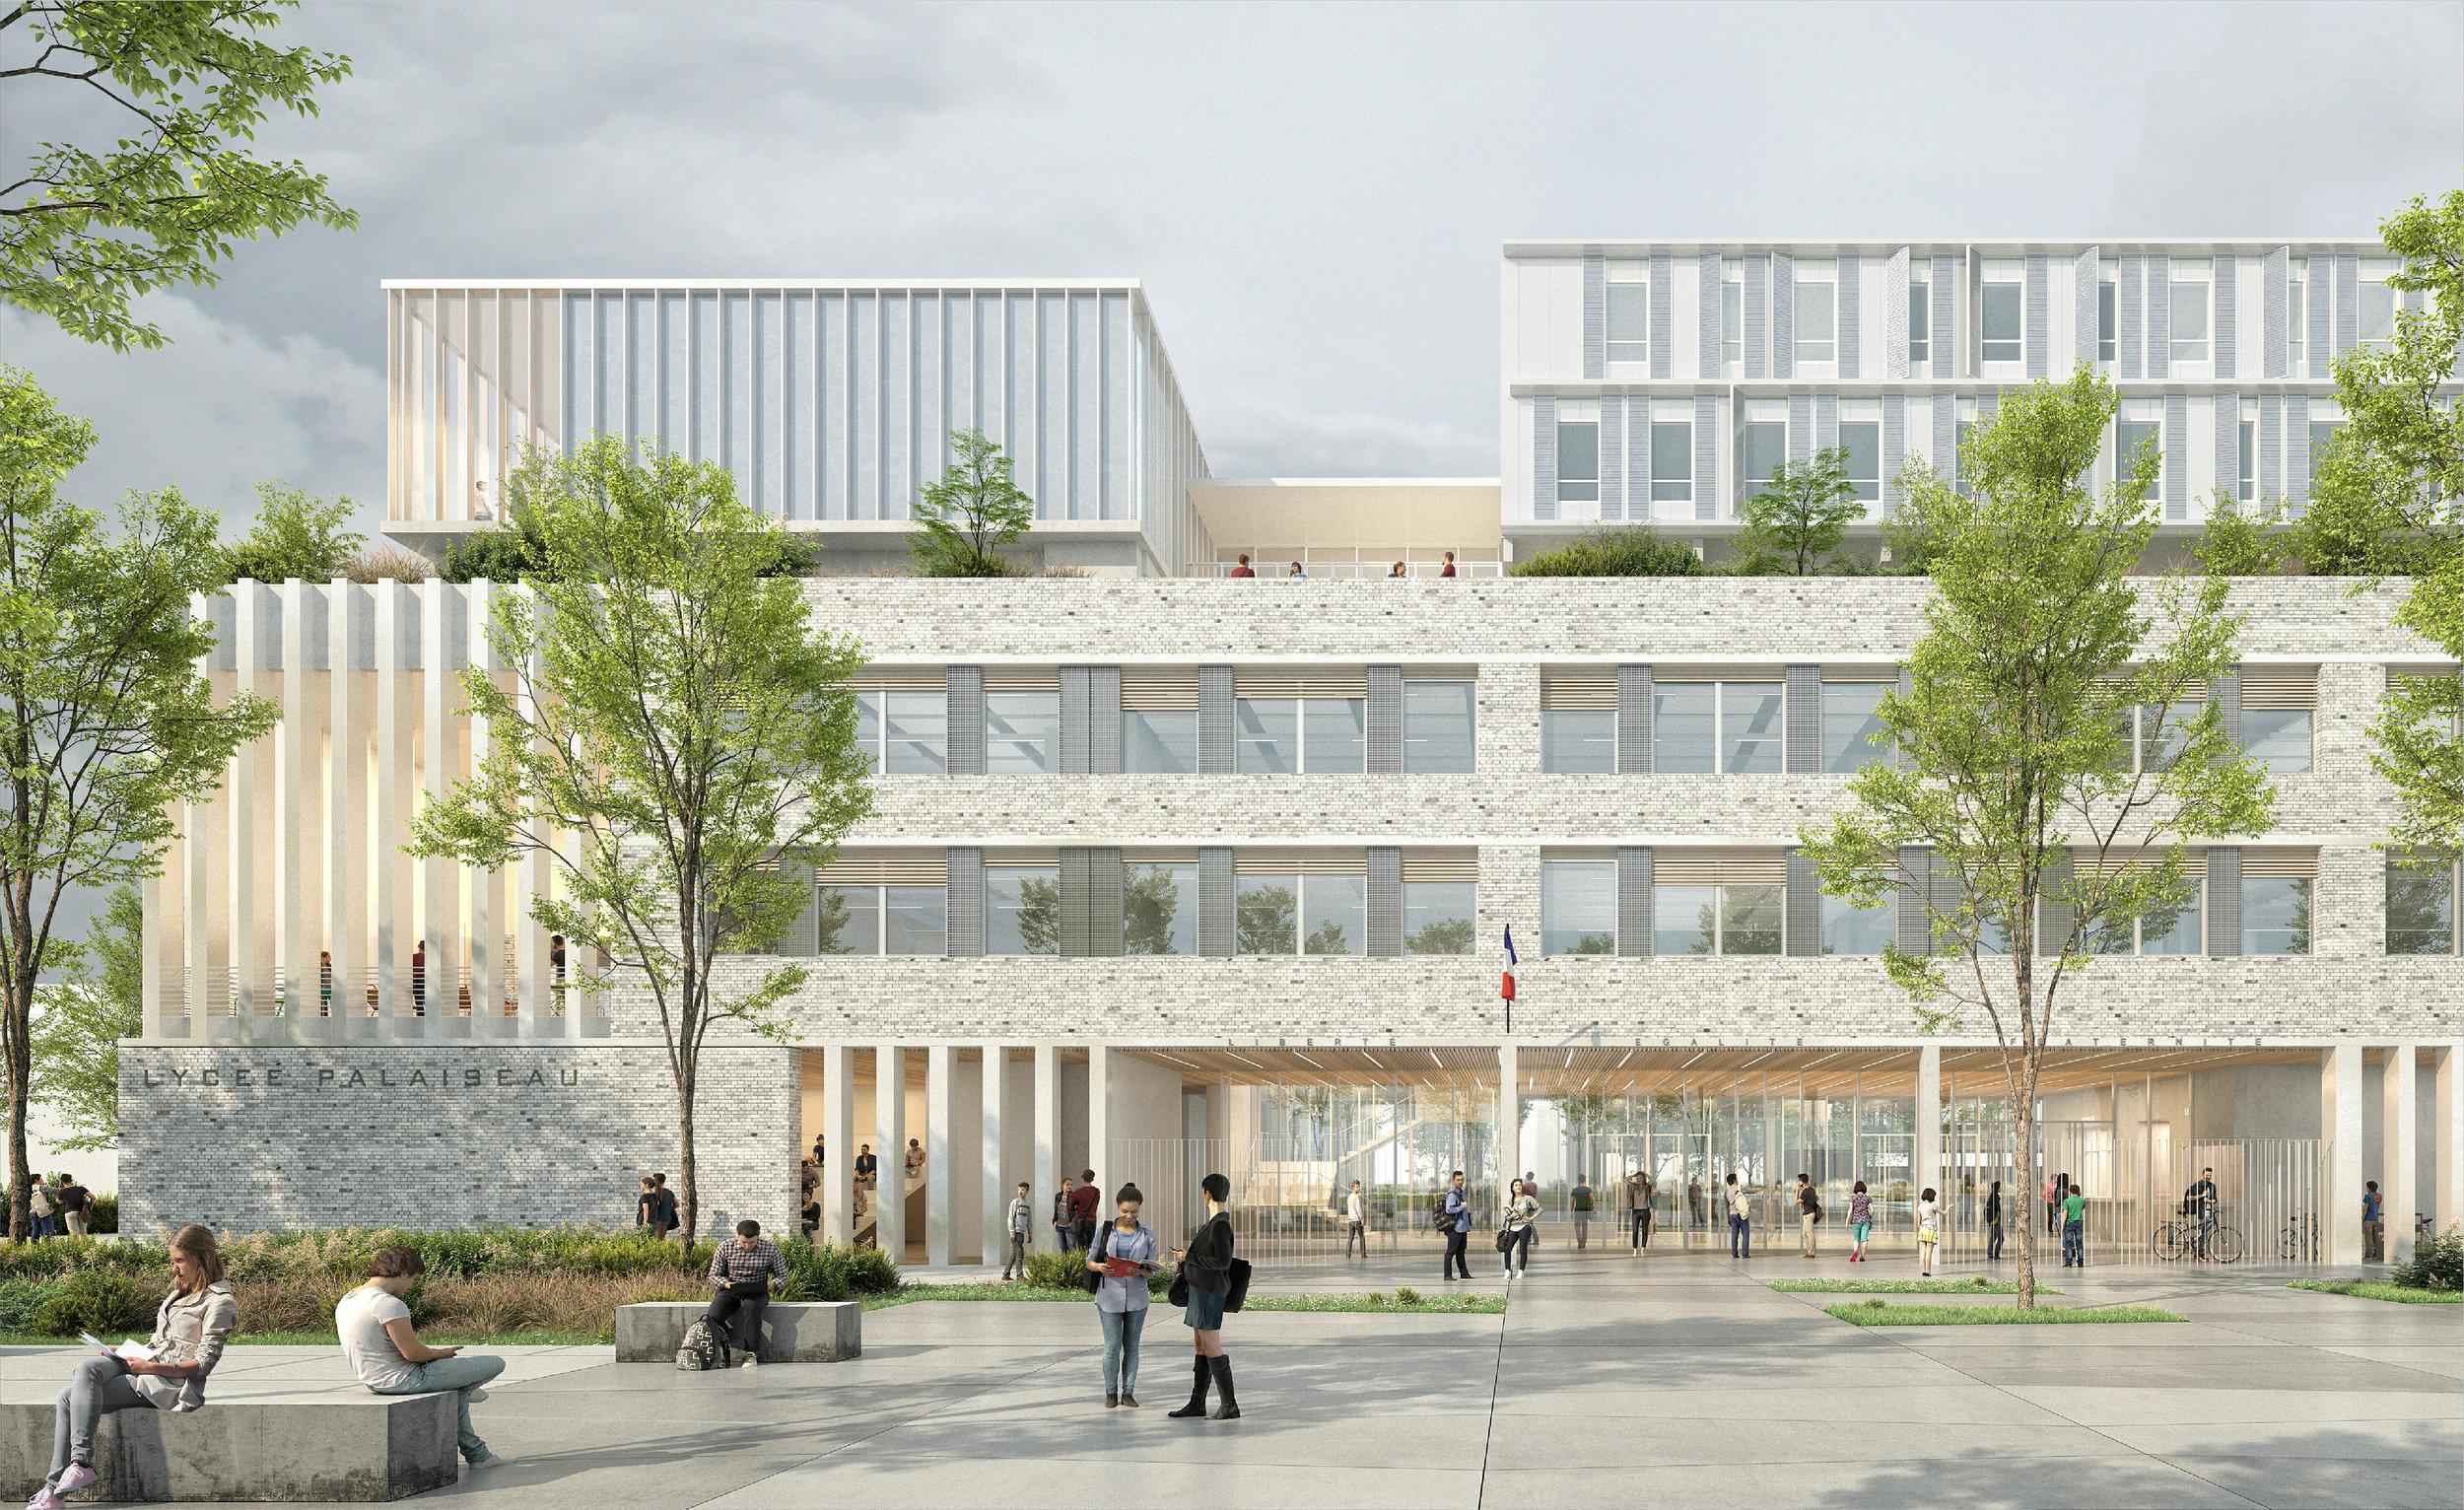 lycée_palaiseau_public_outdoor_design_christophe_gautrand_paysagiste_4.jpg